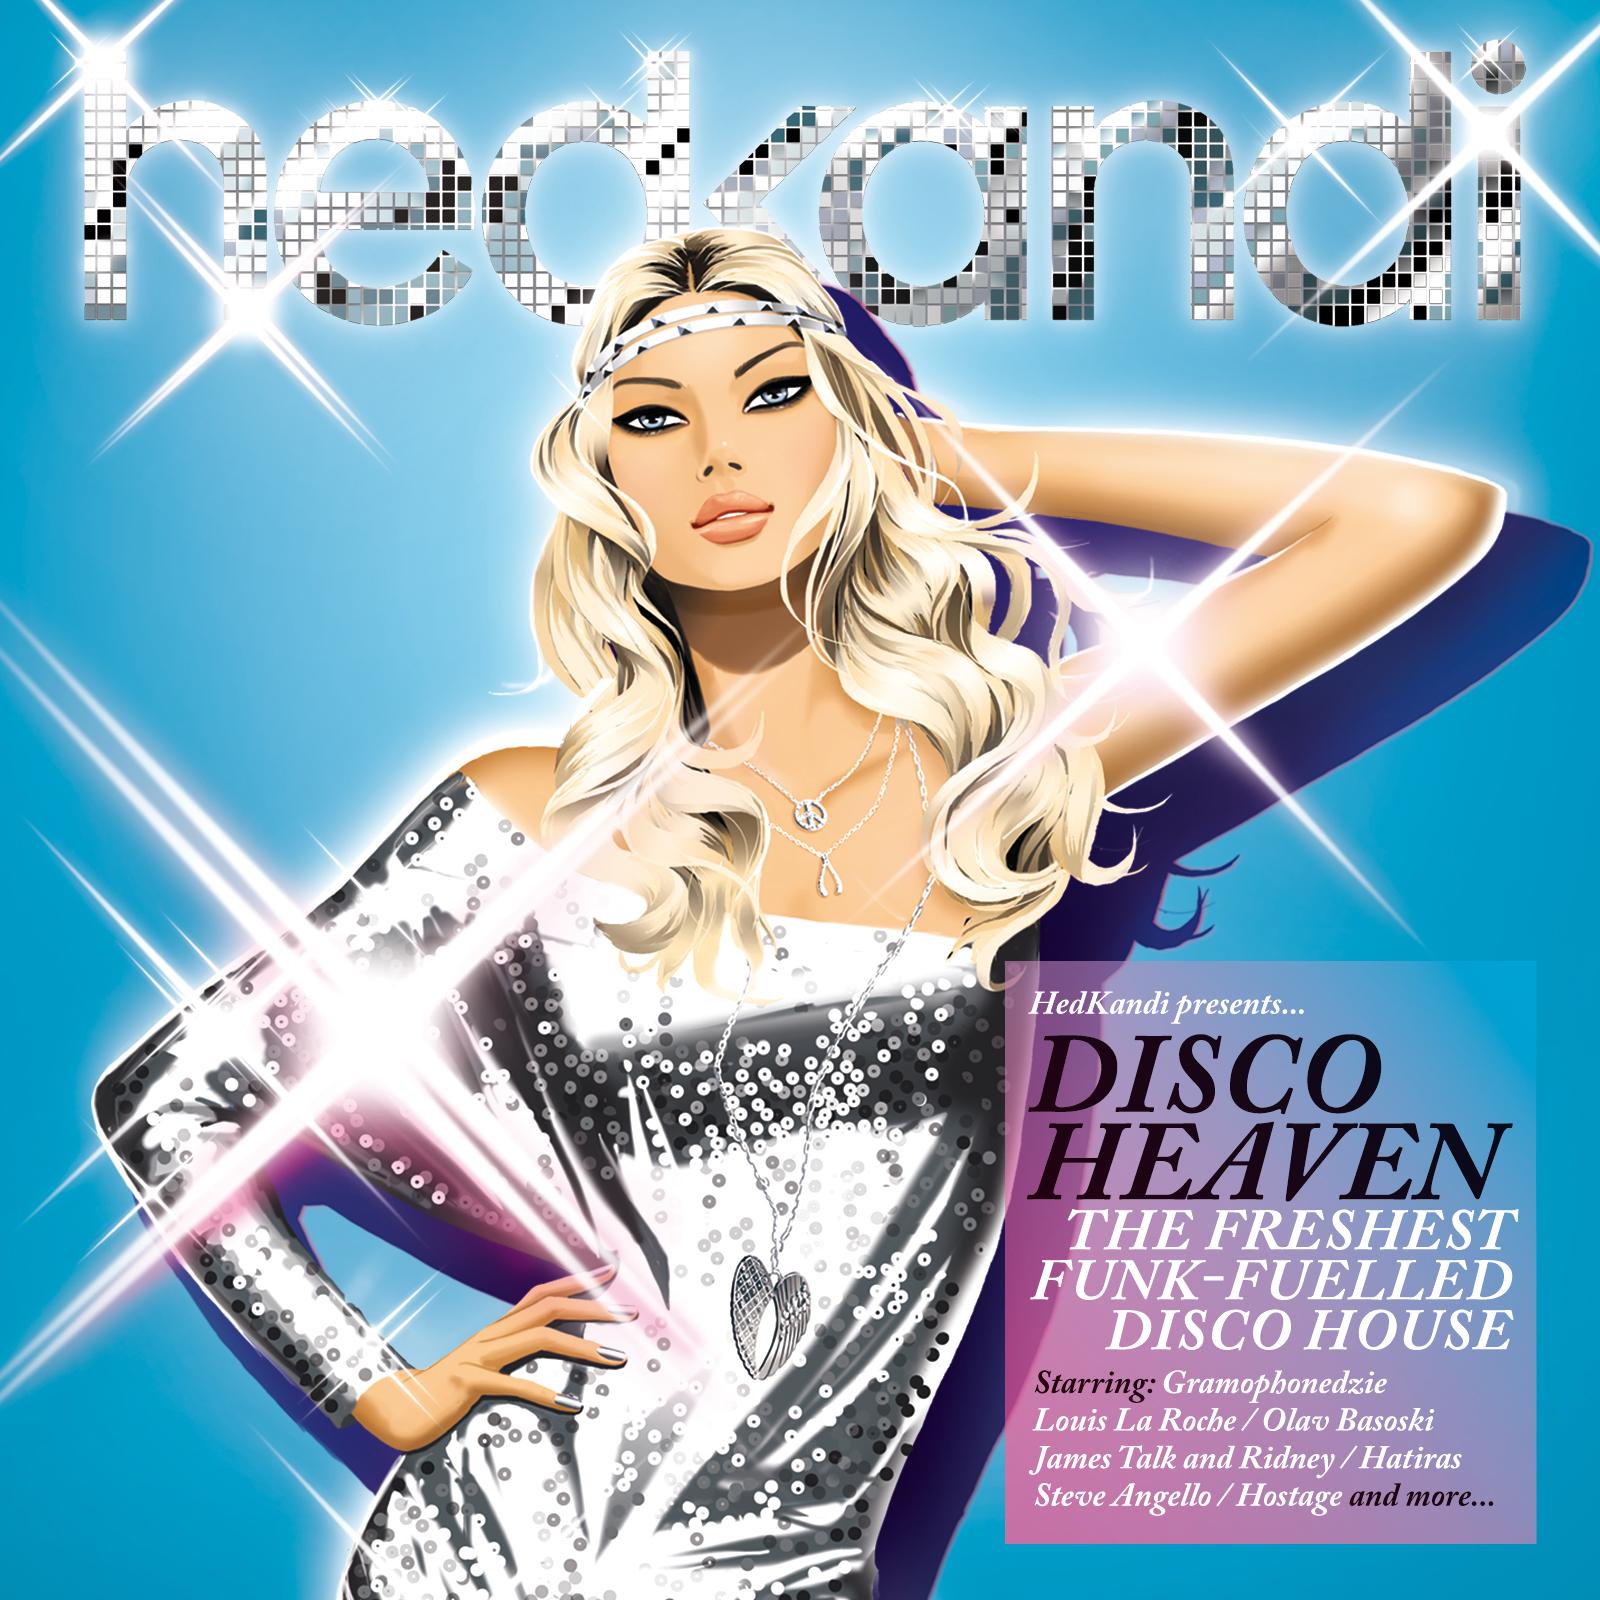 Hed Kandi Beach House 04 04: Electronic Dance Music